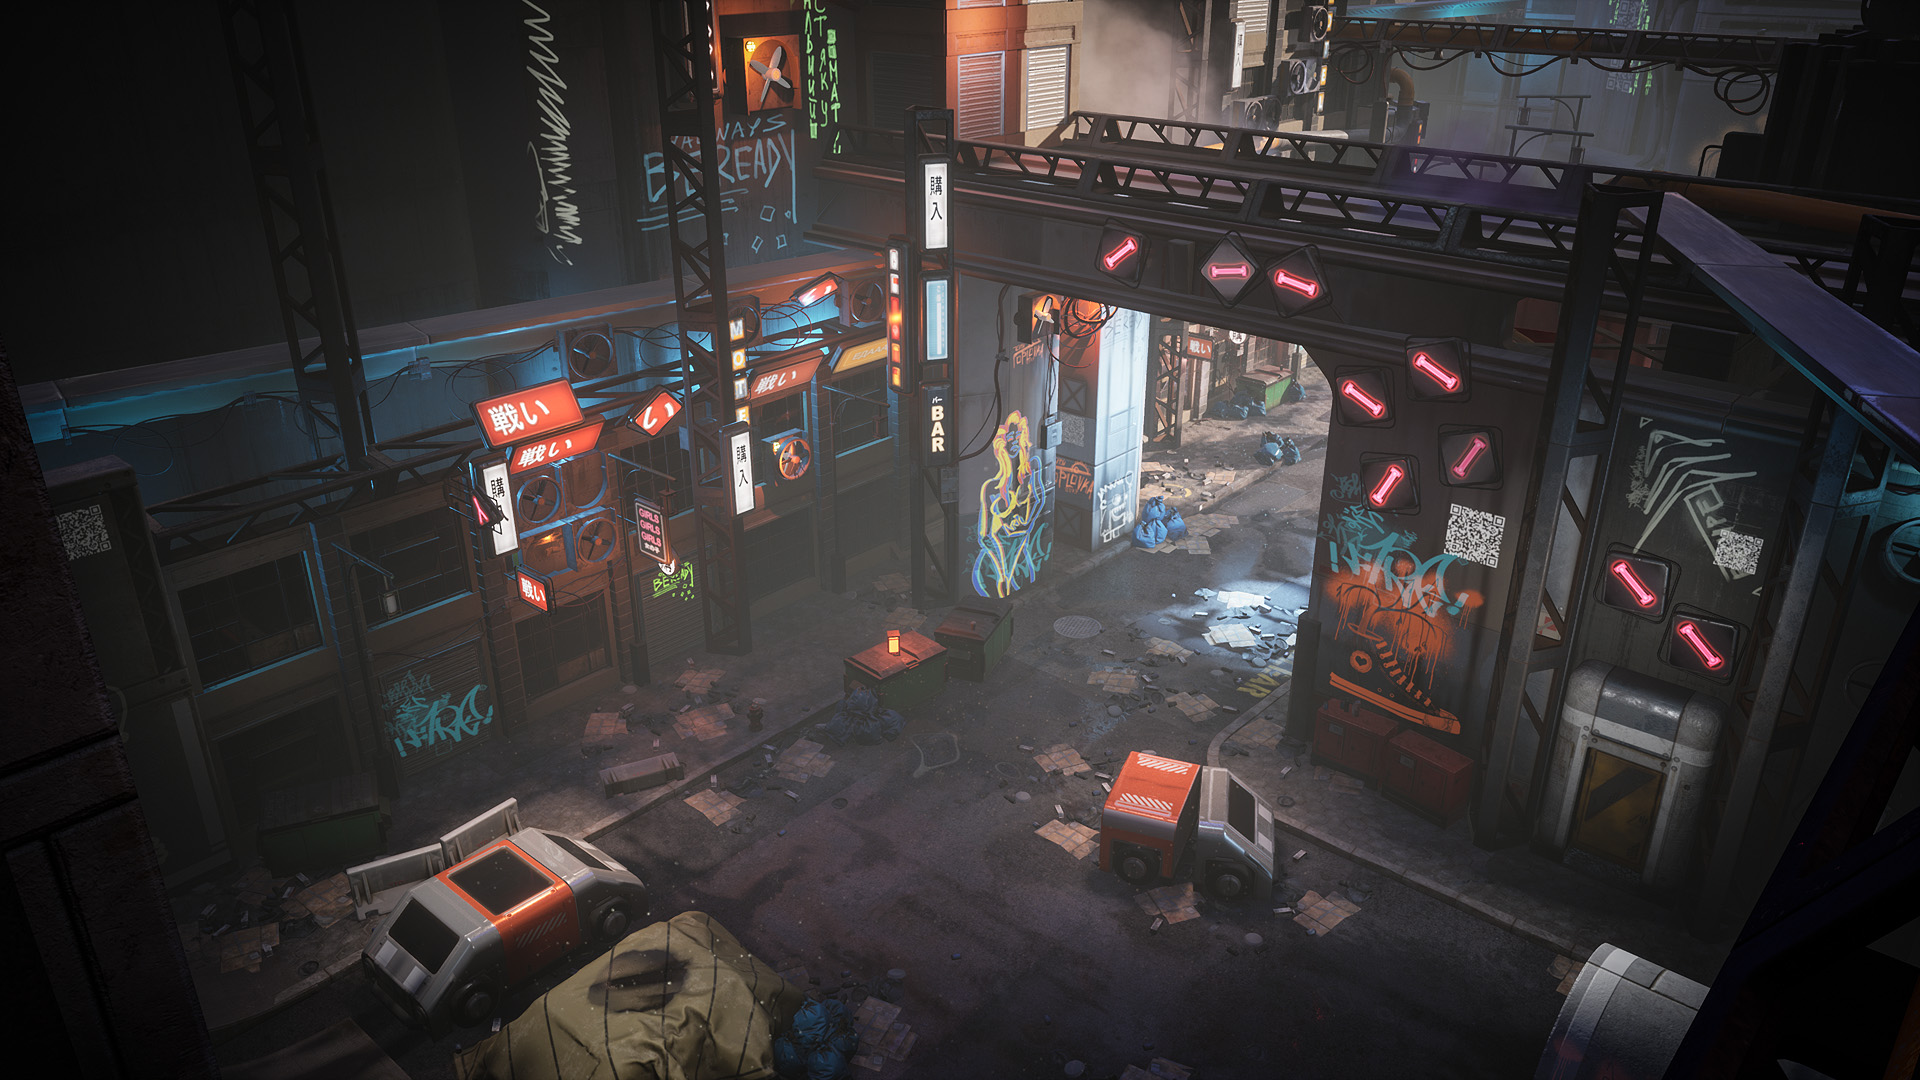 Cyberpunk Environment Kitbash Set by Denys Rutkovskyi in